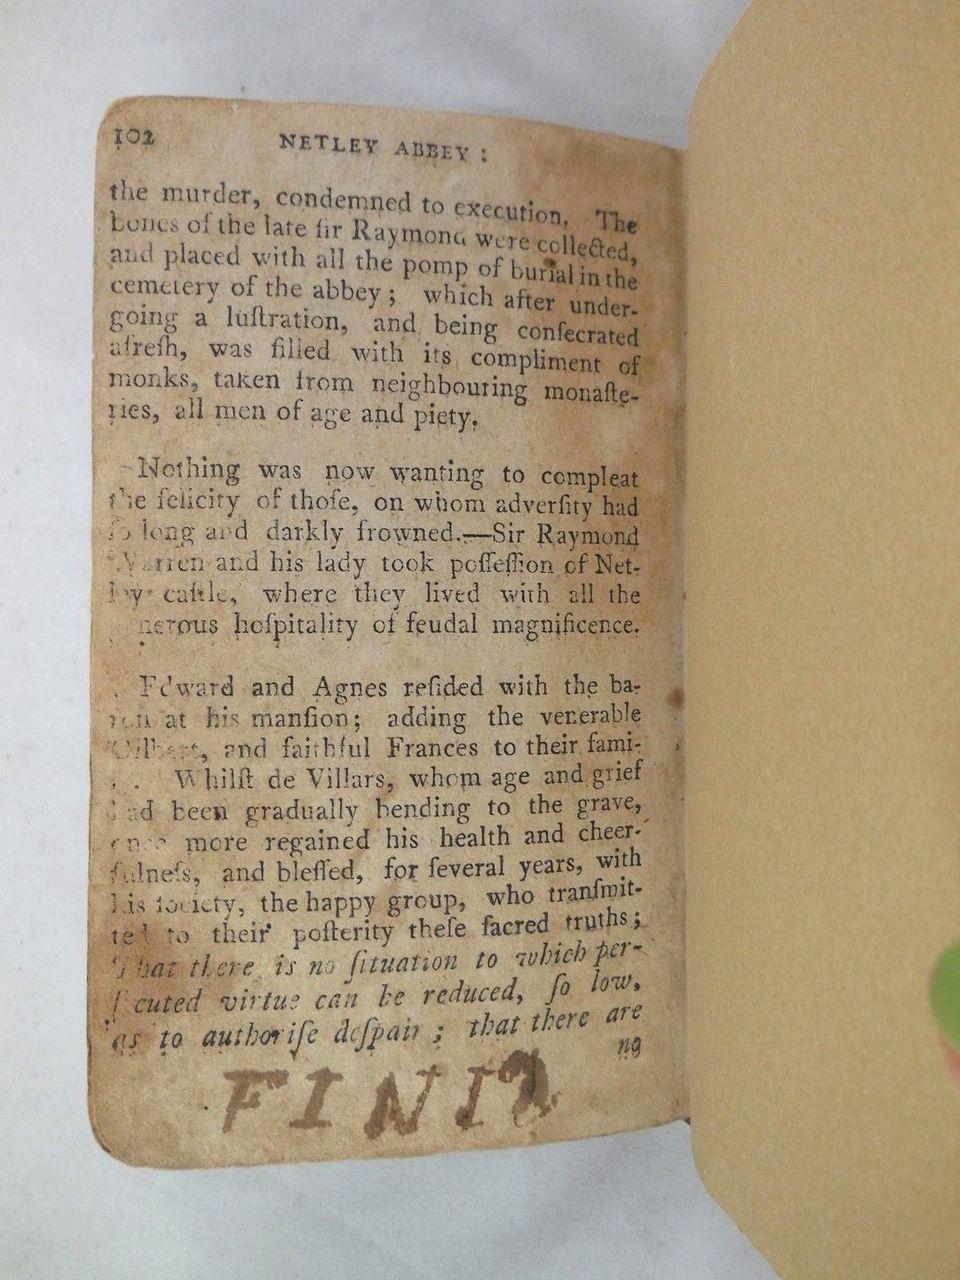 NETLEY ABBEY, A Gothic Story, by Richard Warner - 1796 [rebound]